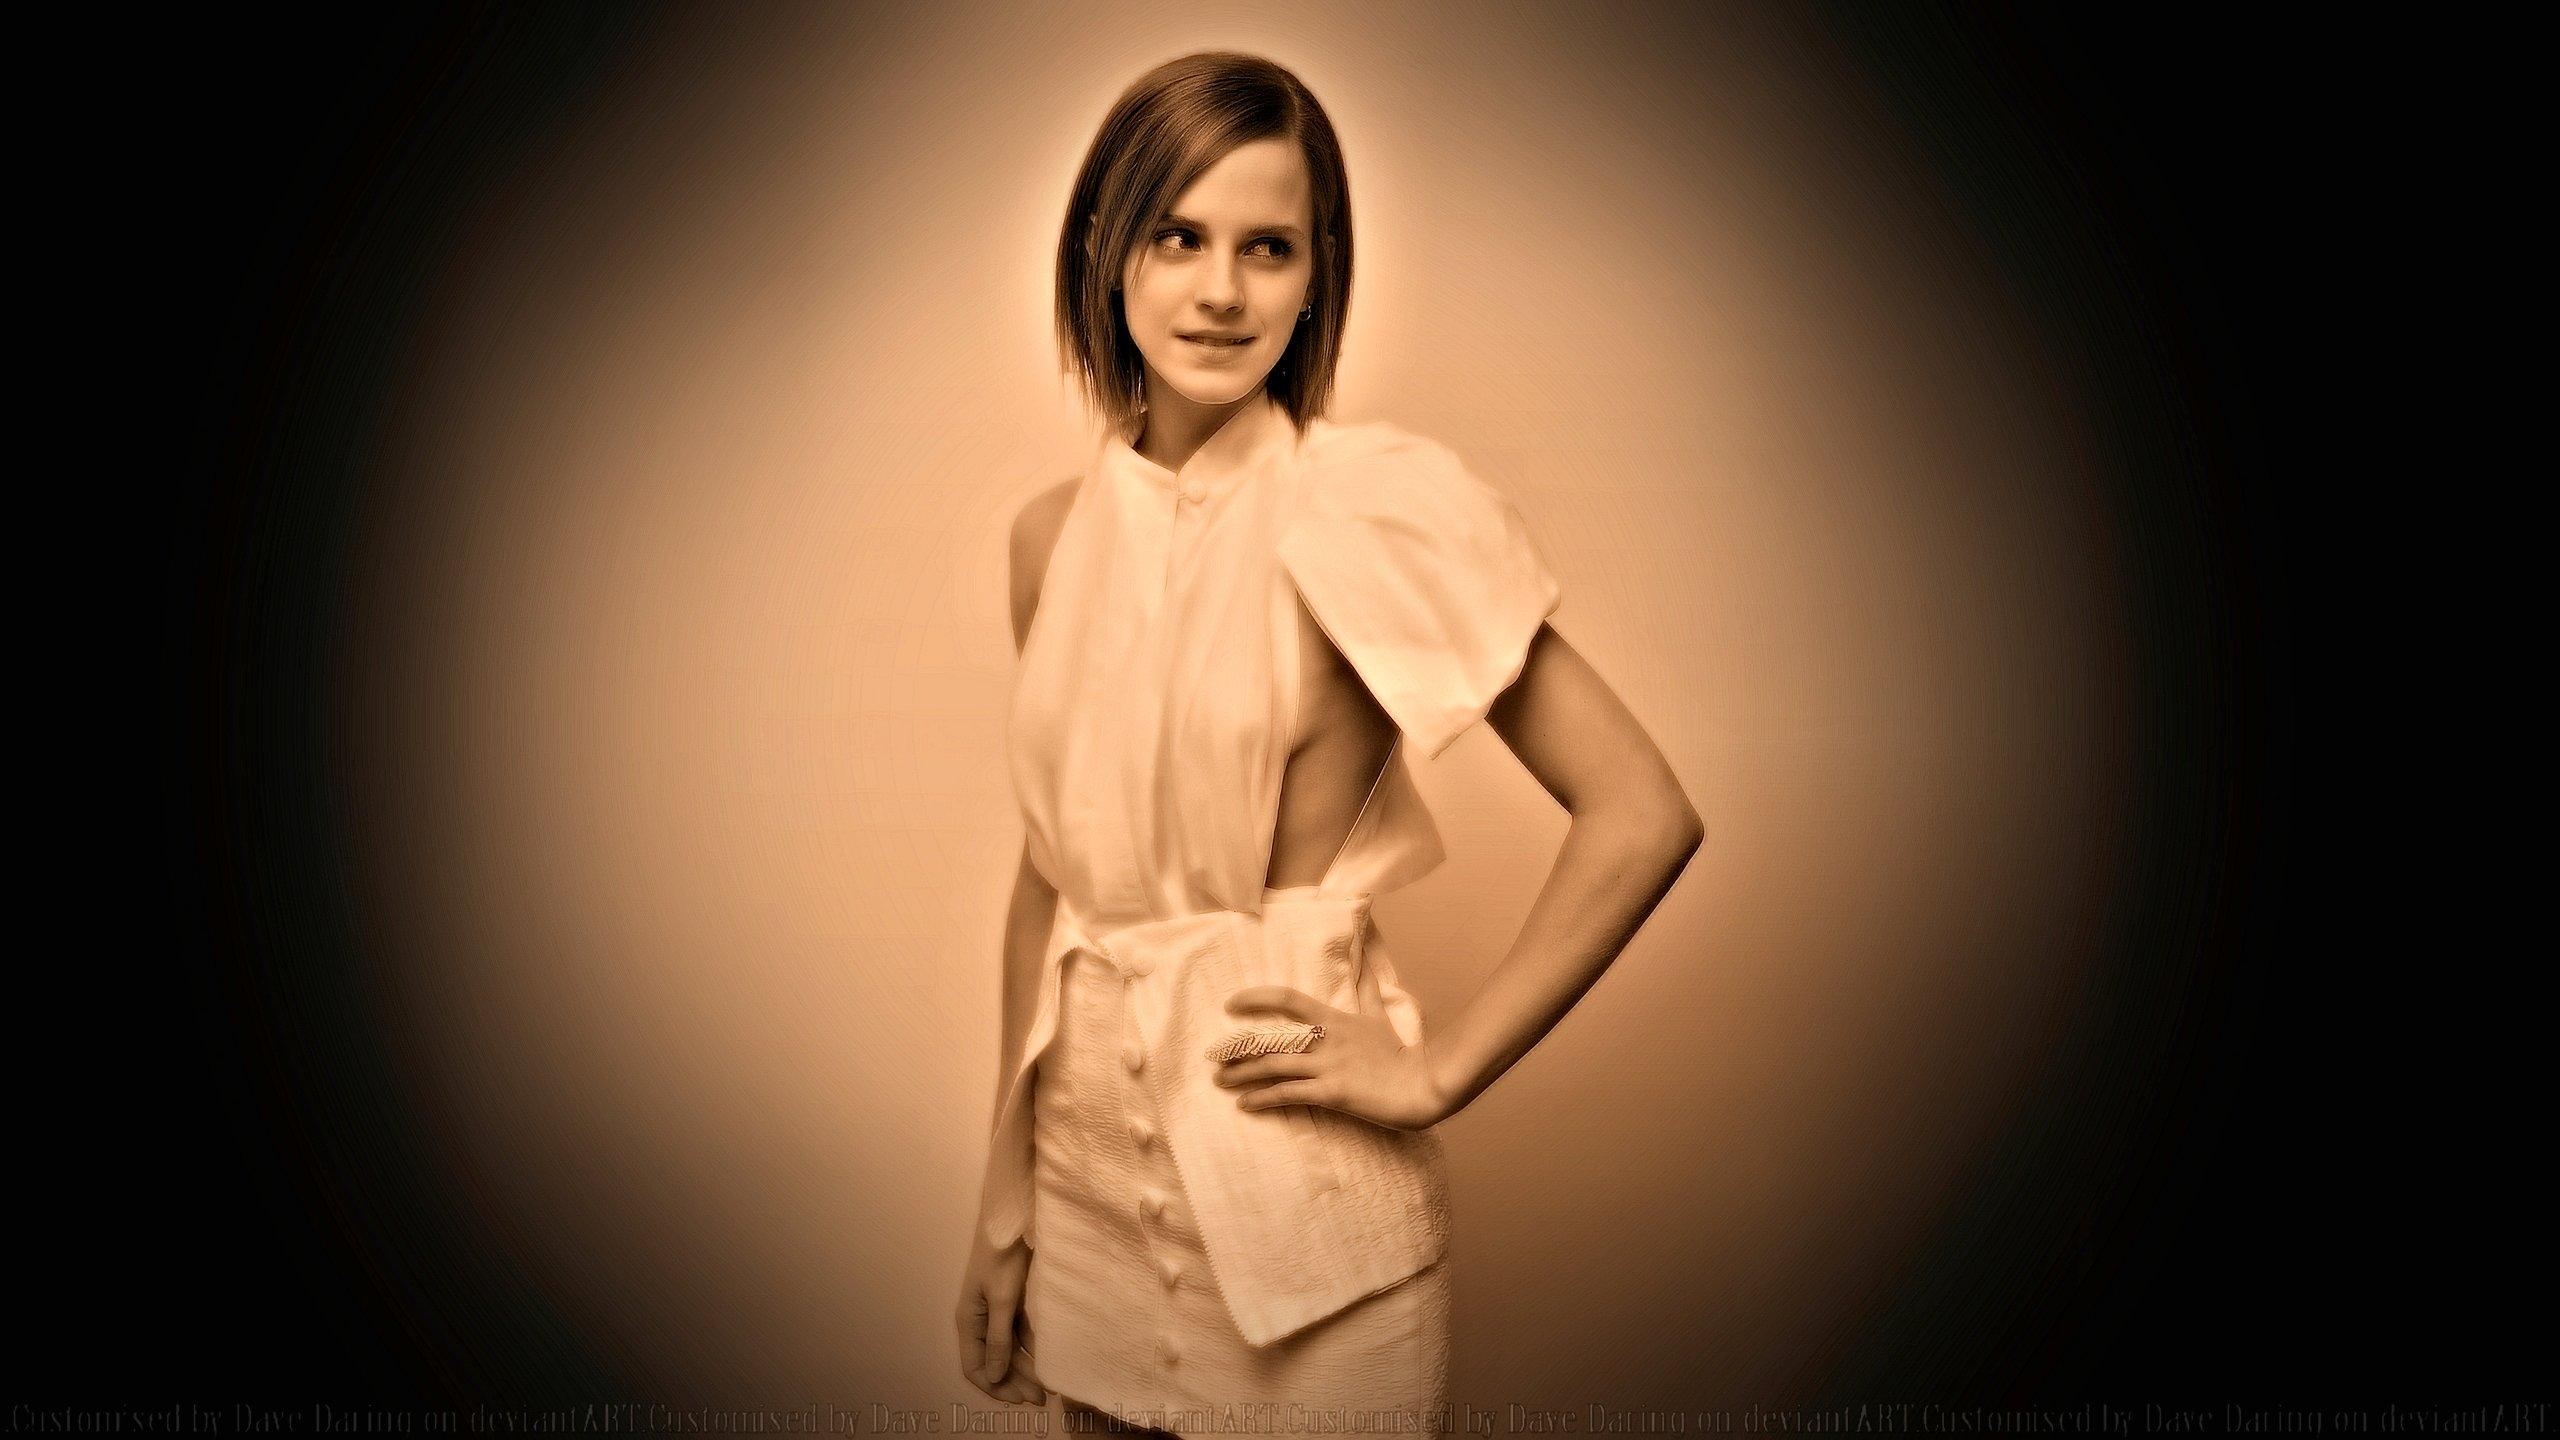 Emma Watson Wallflower NY Vintage by Dave-Daring